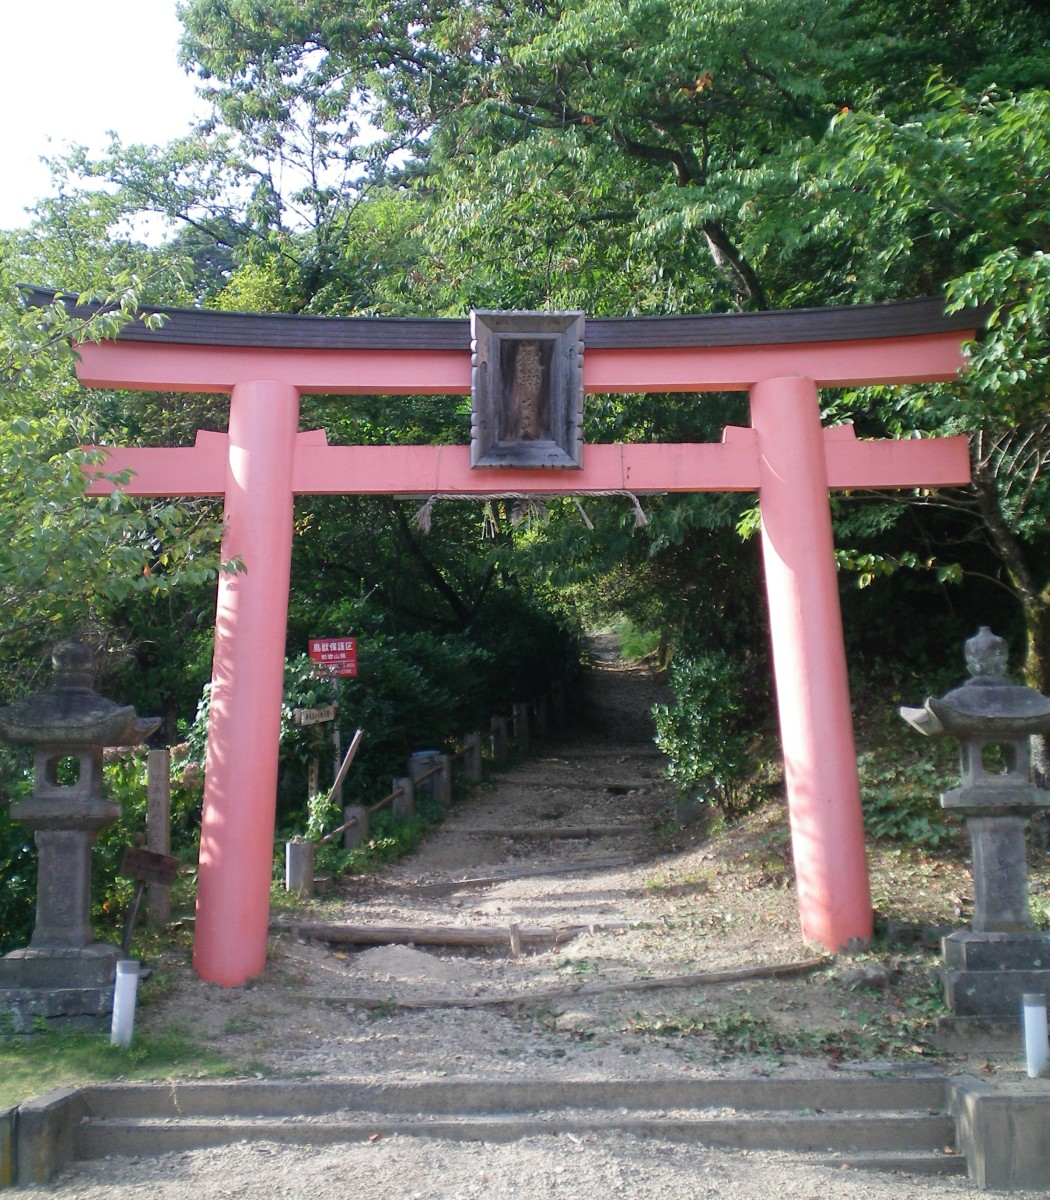 The entrance to Koya-san (c) A. Harrison